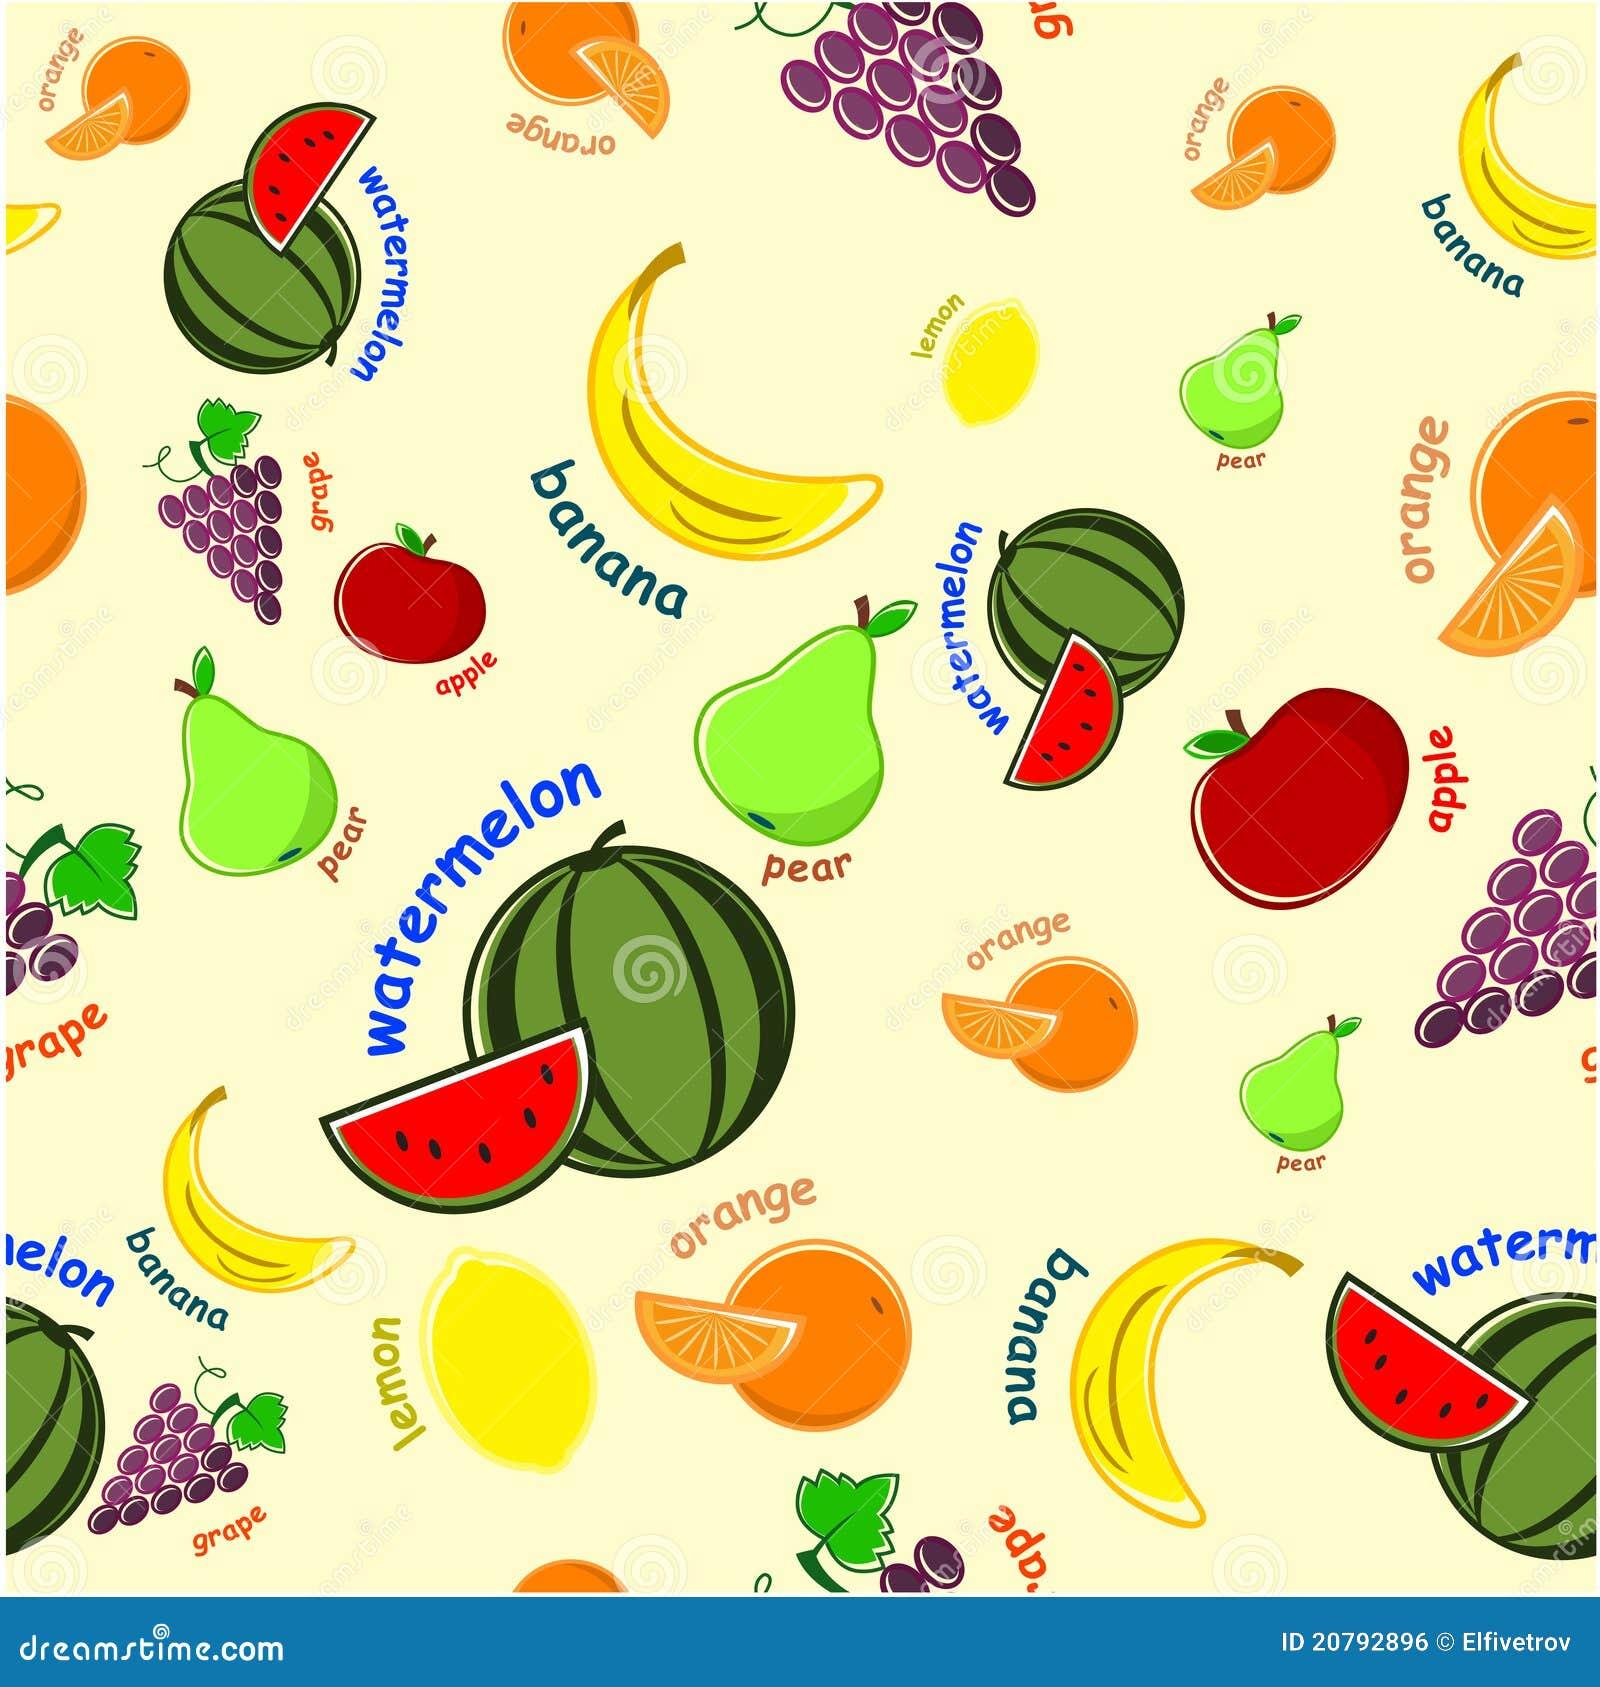 Fruit Pattern Royalty Free Stock Image - Image: 20792896